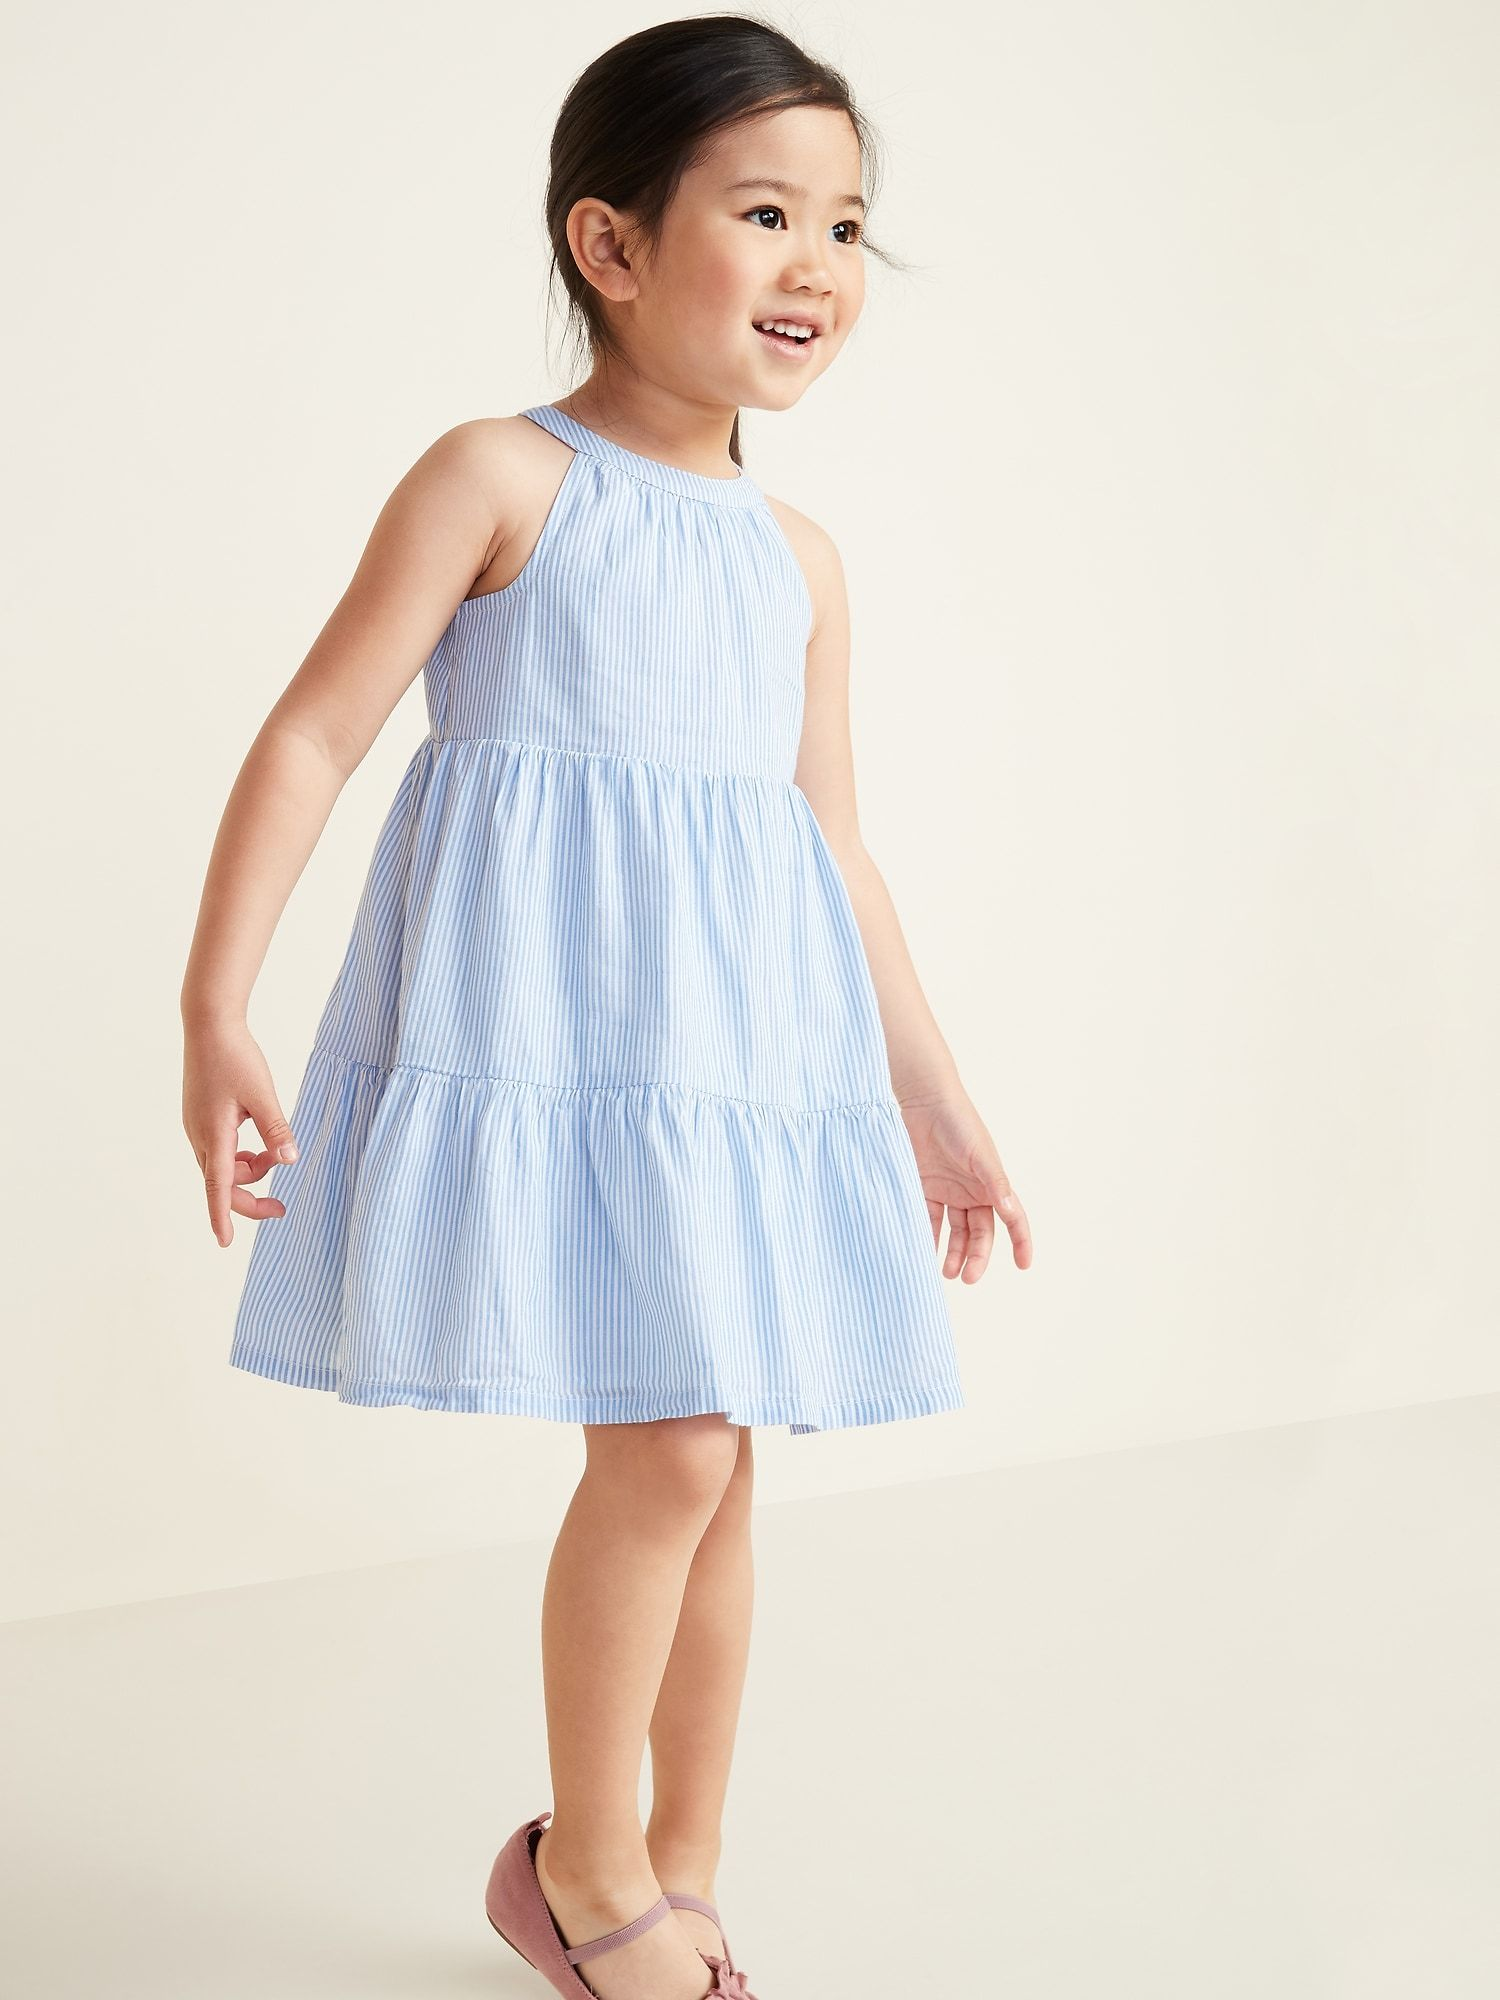 Tiered Halter Dress For Toddler Girls Toddler Girl Dresses Toddler Dress Little Girl Dresses [ 2000 x 1500 Pixel ]